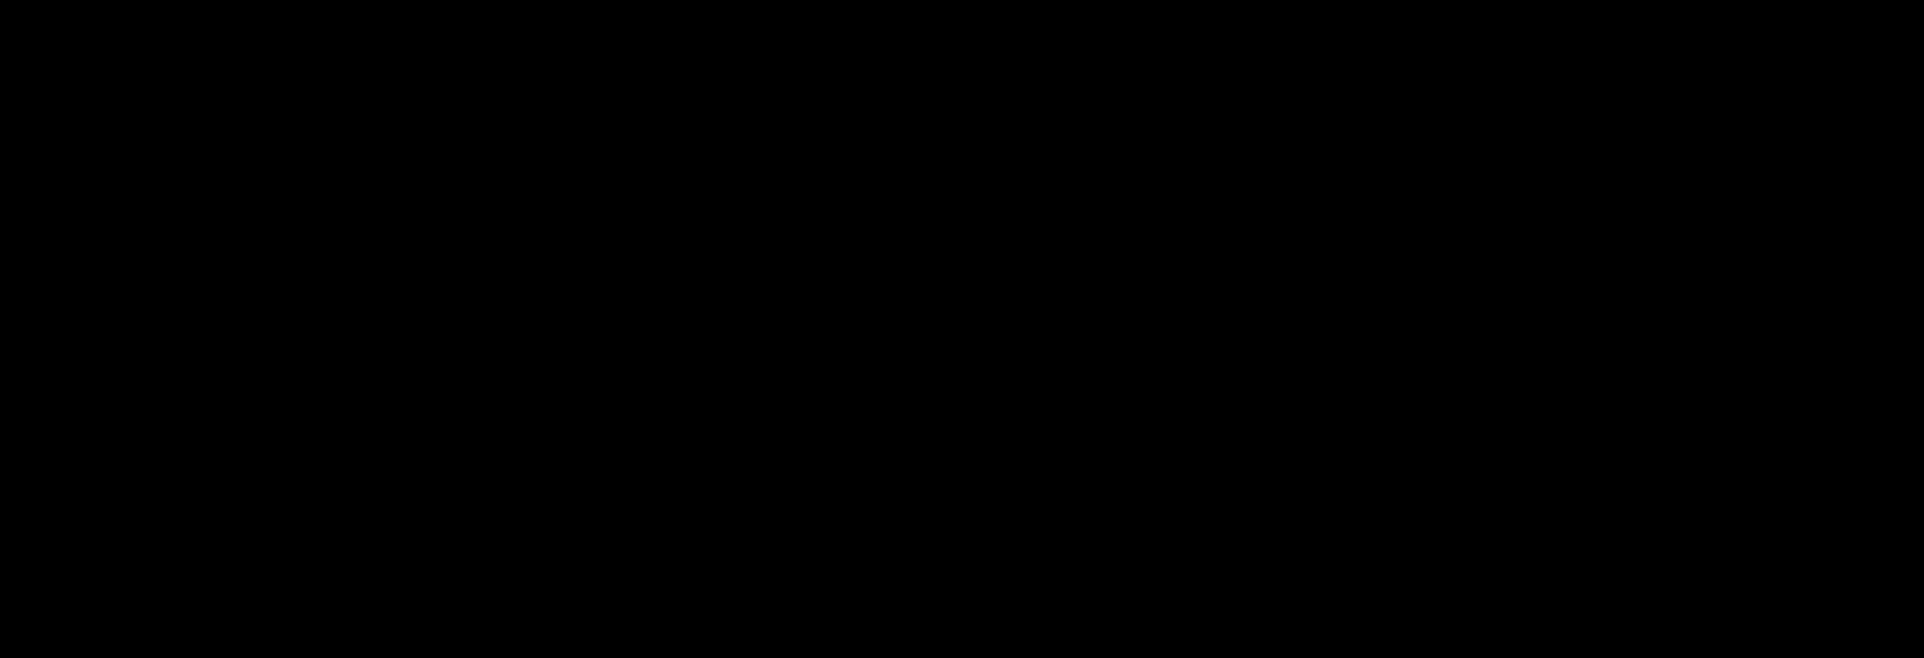 (±)-Metoprolol-d<sub>7 </sub>hydrochloride (iso-propyl-d<sub>7</sub>)